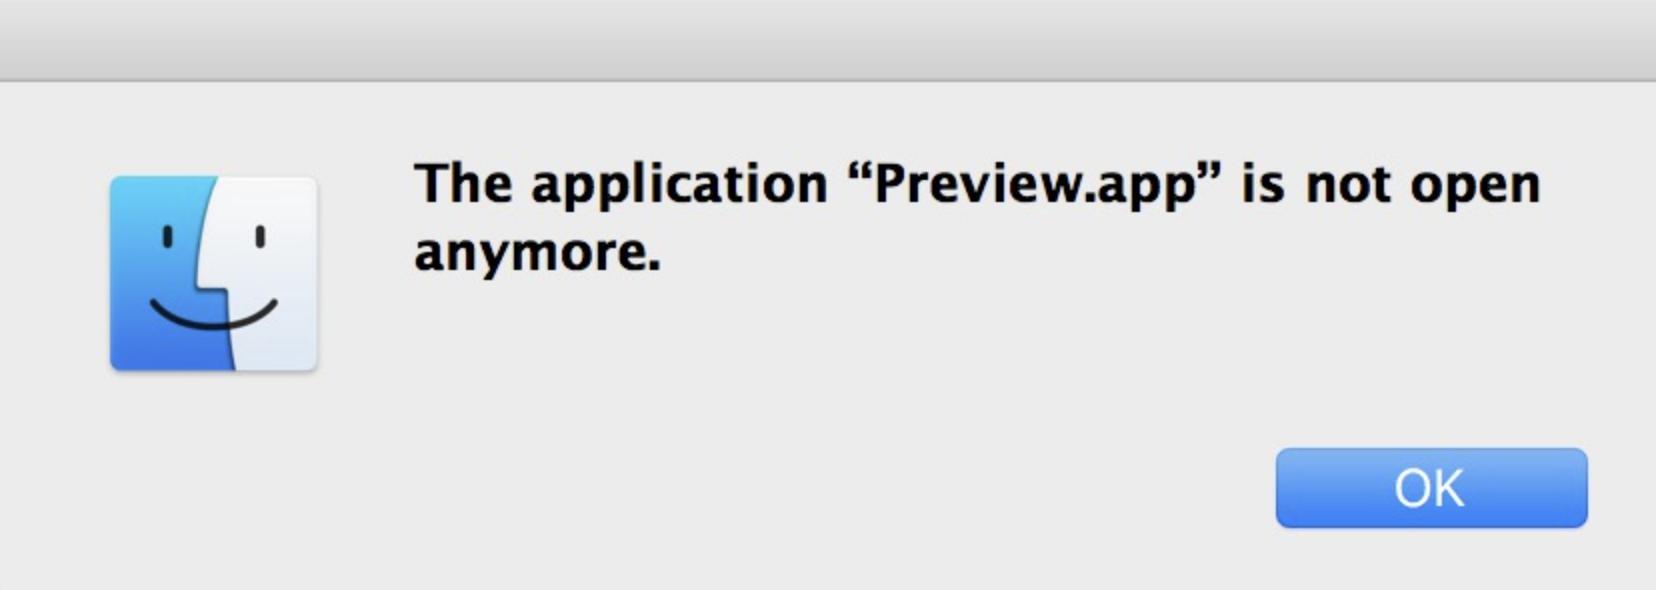 Preview App error message